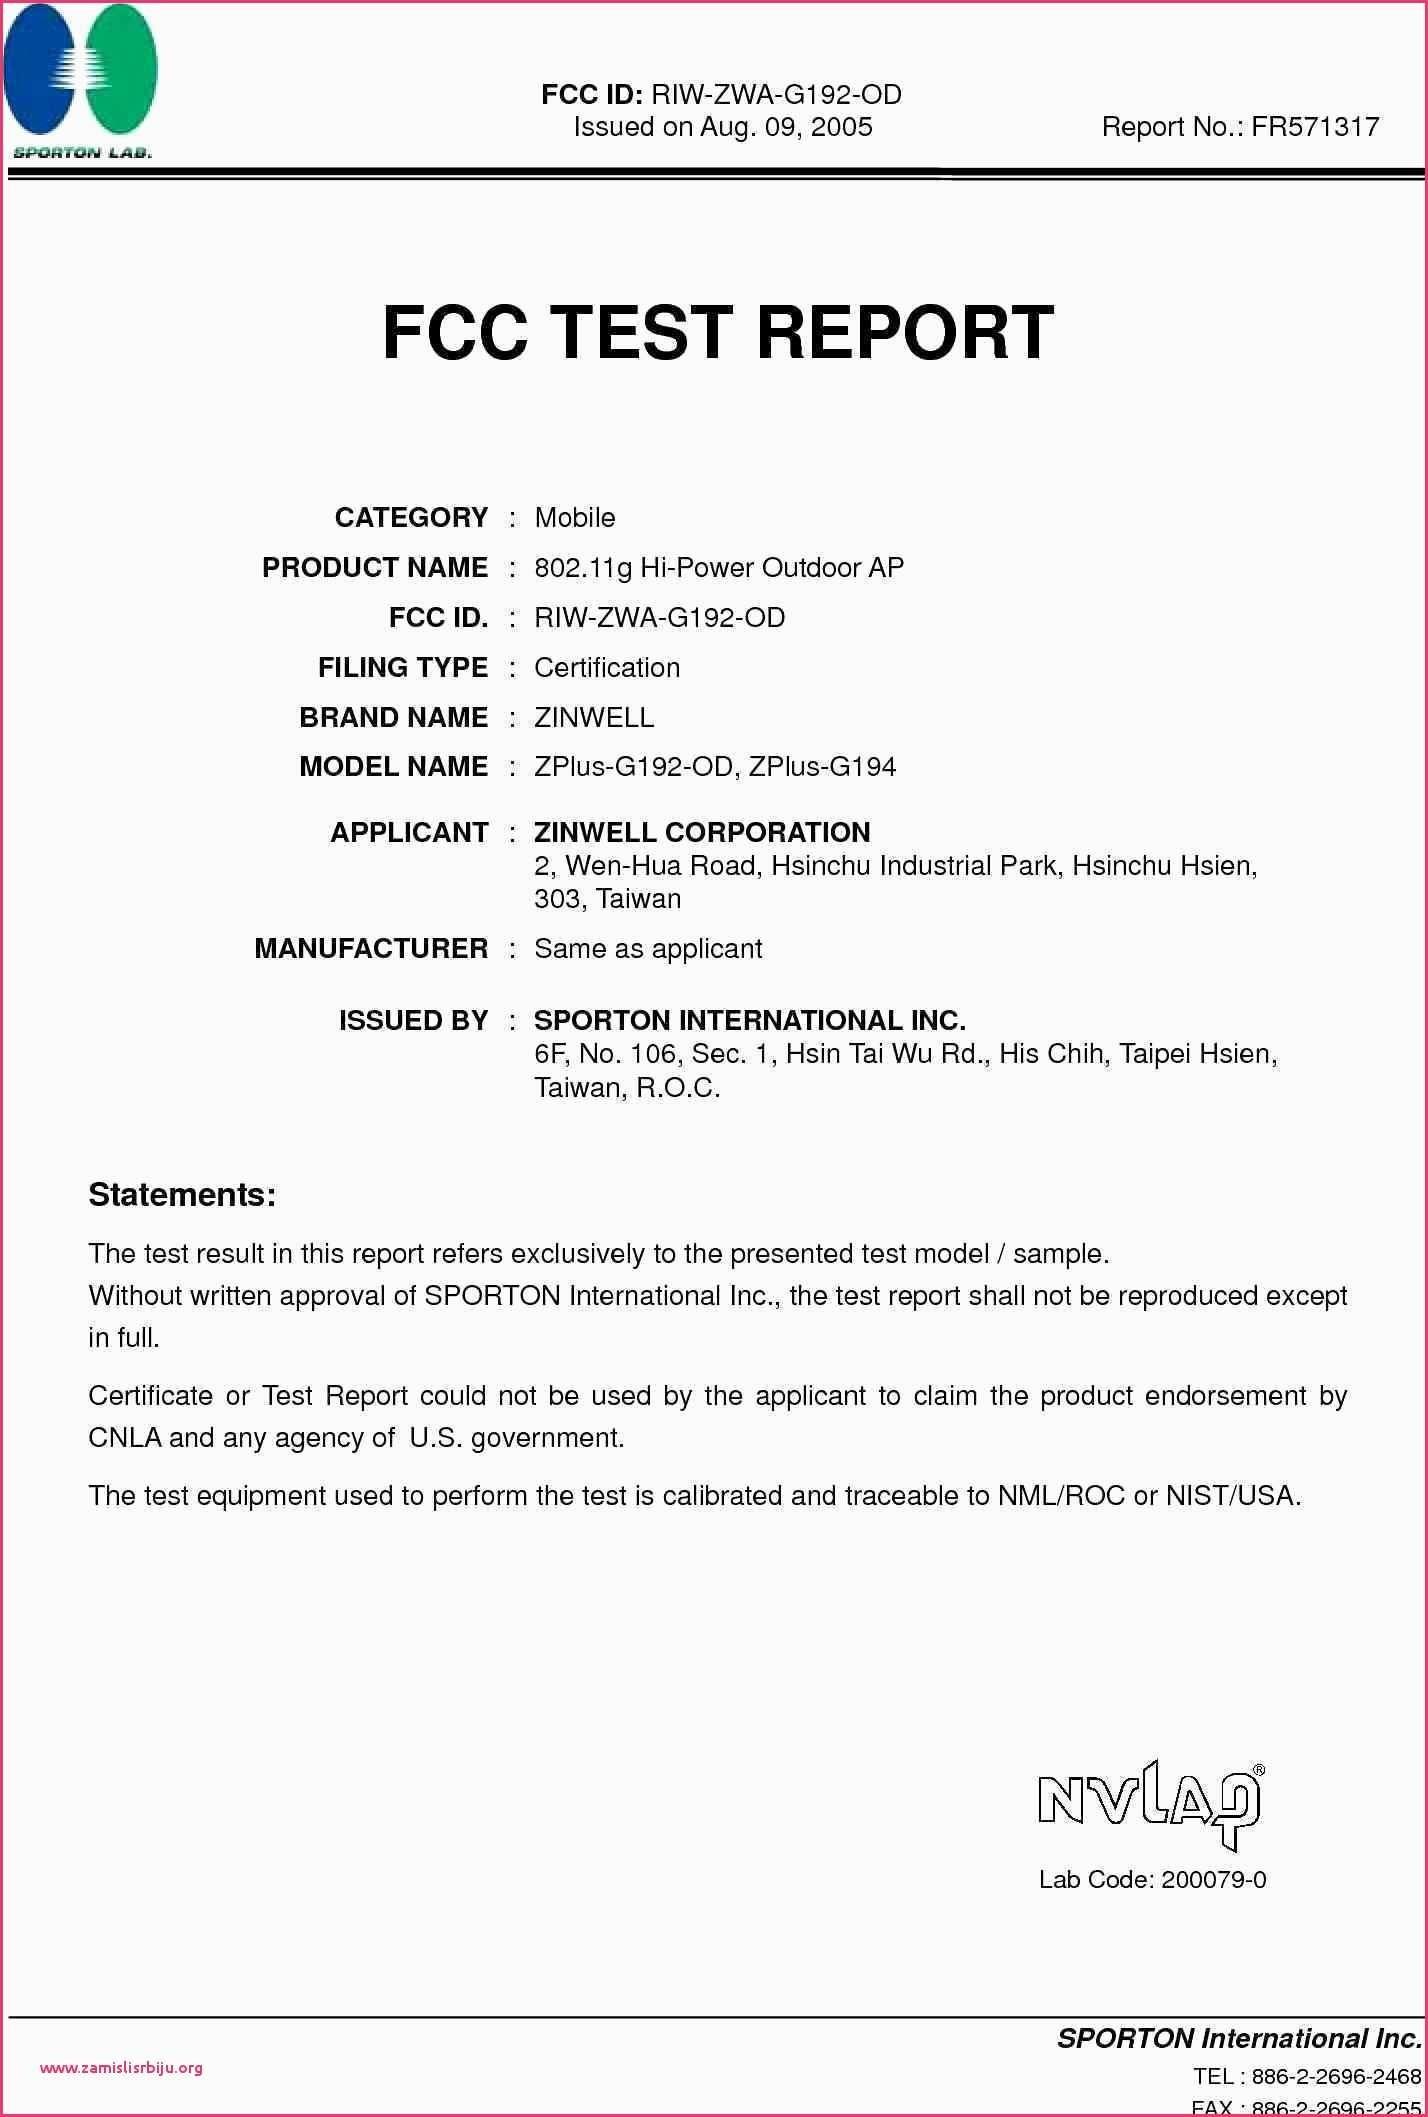 Certificate Sample Word format Cool Certificate Samples Word format